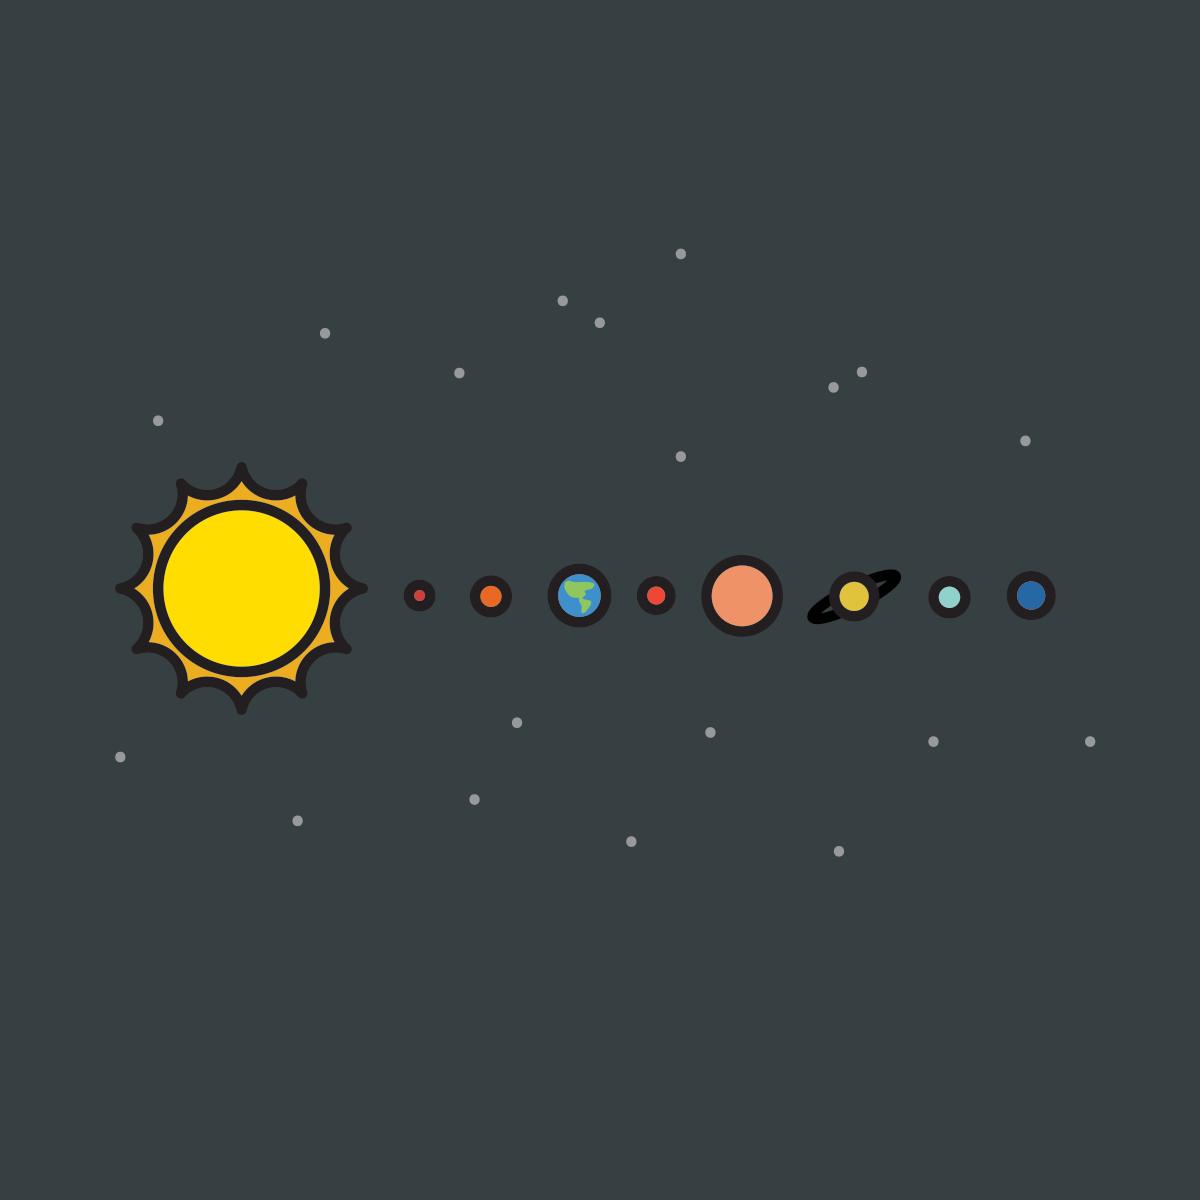 117 solar system